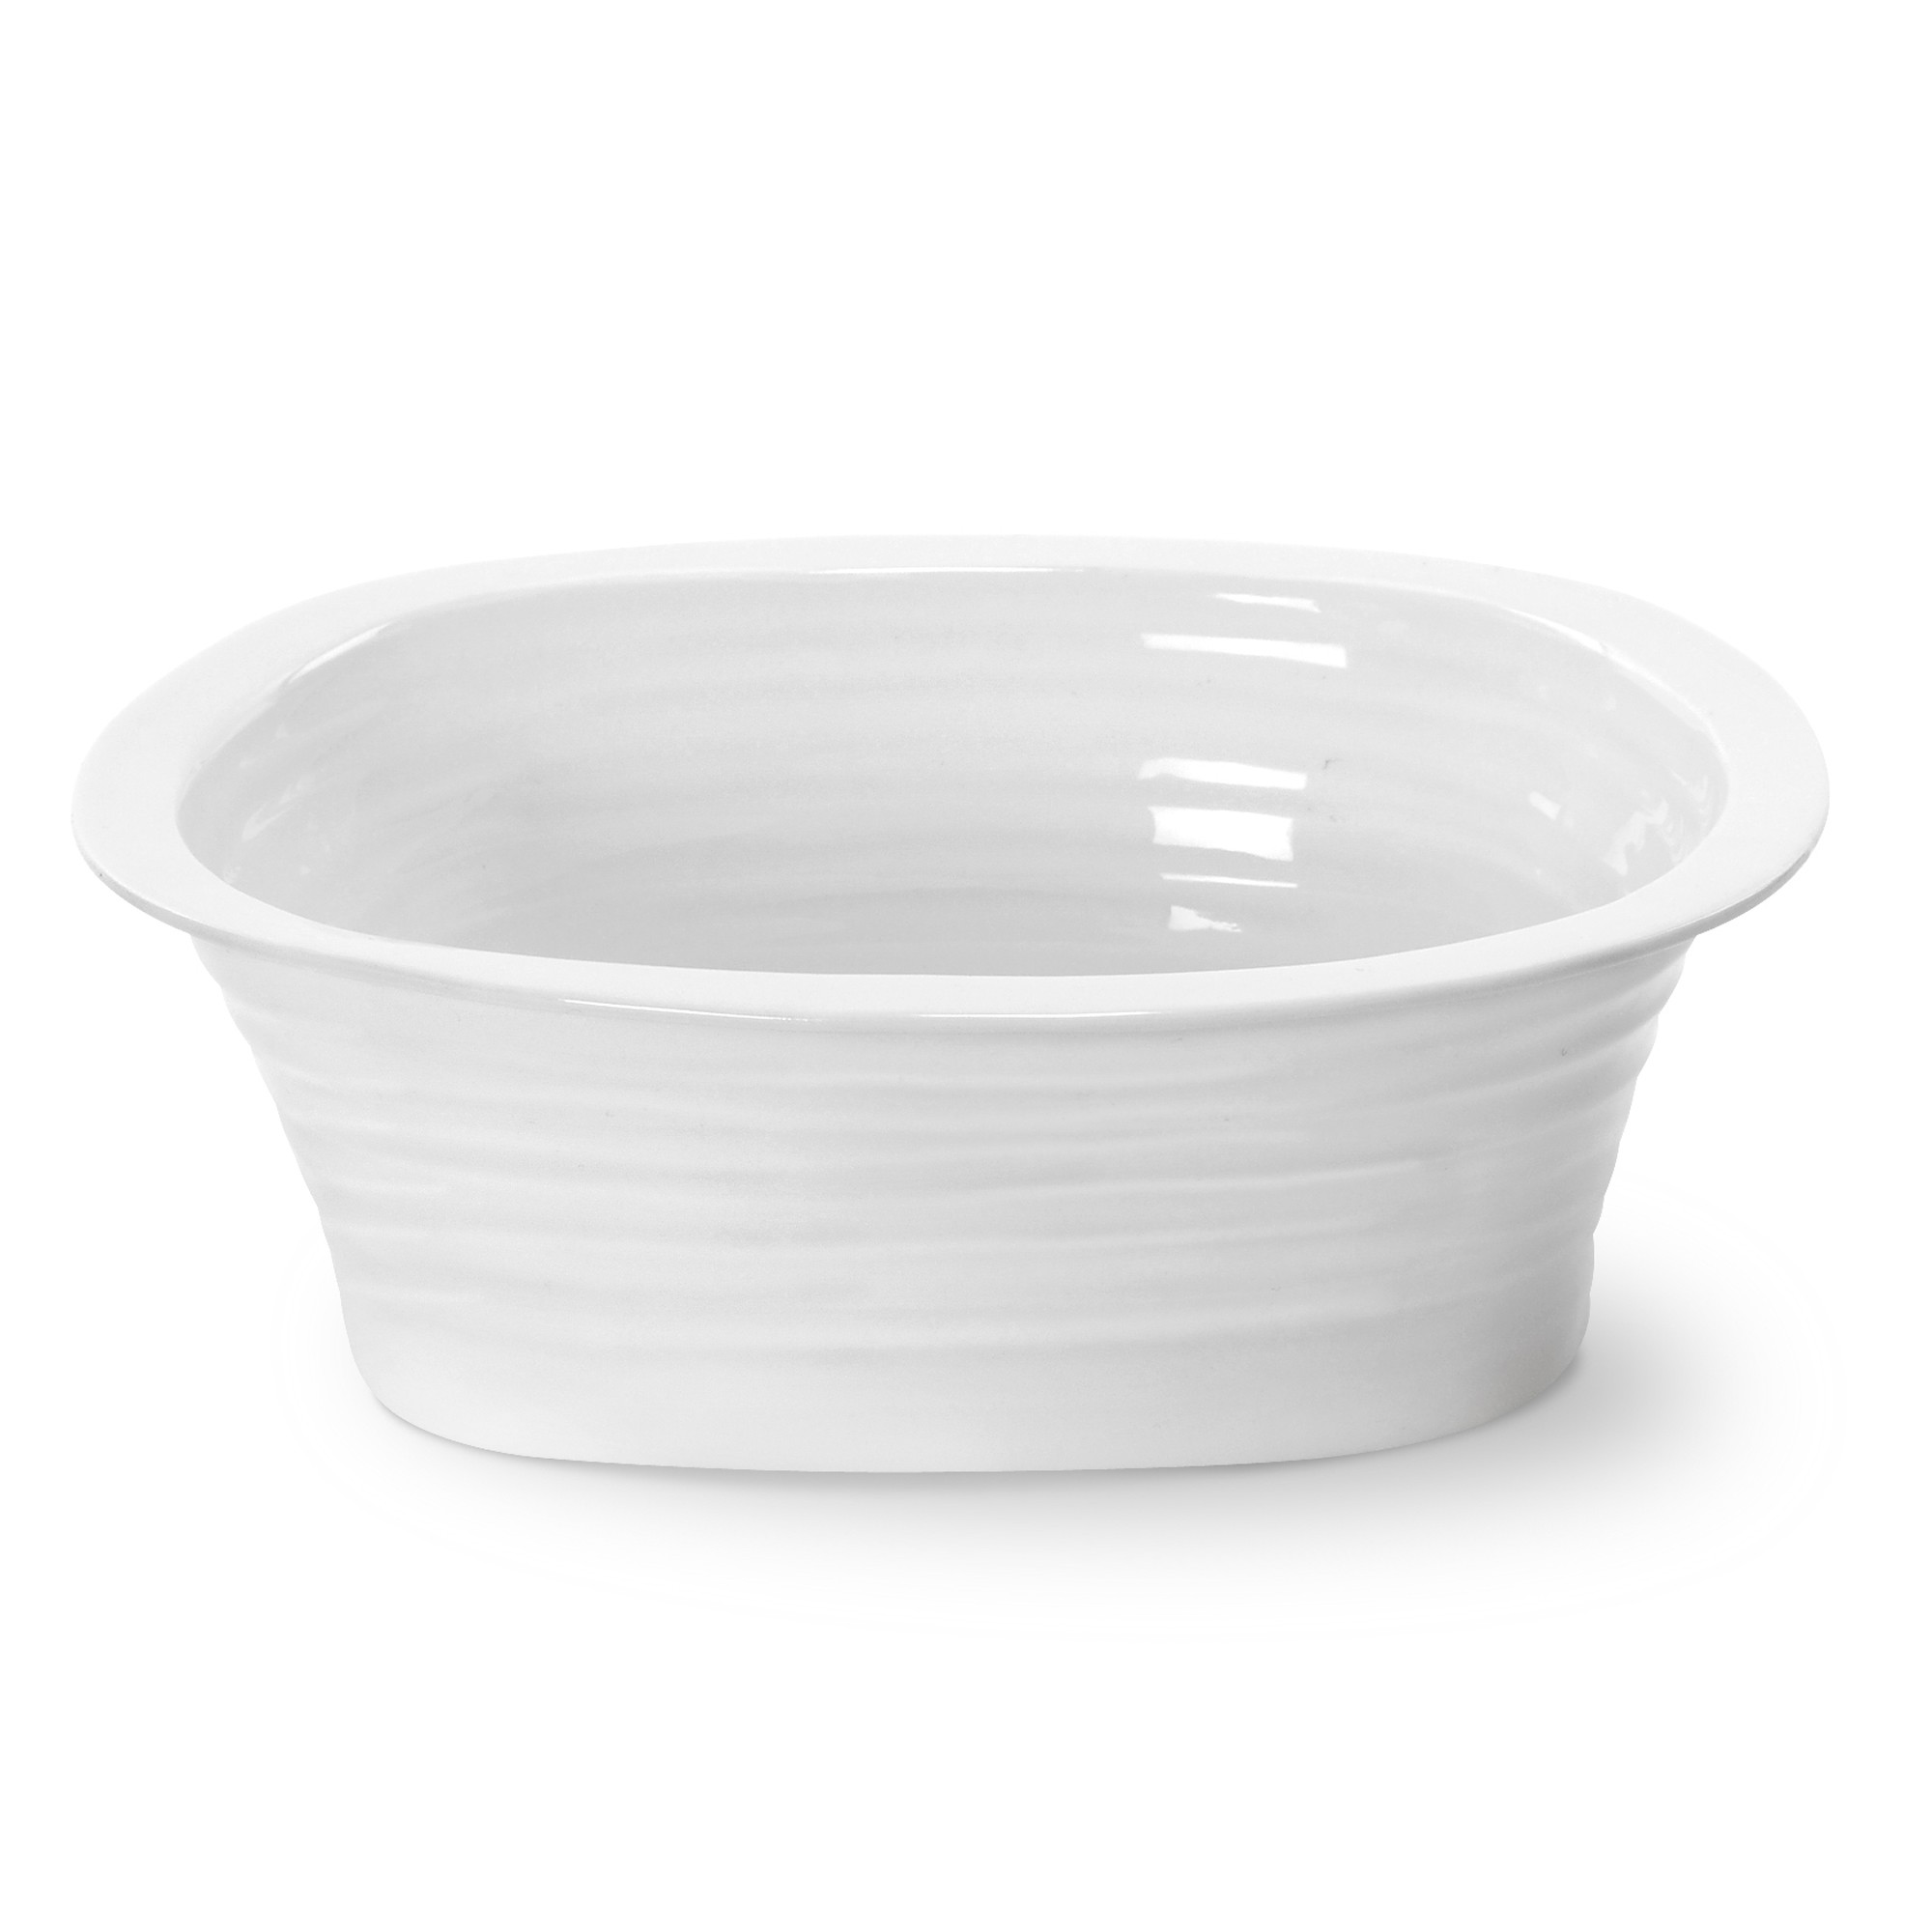 Sophie Conran for Portmeirion White Rectangular Pie Dish